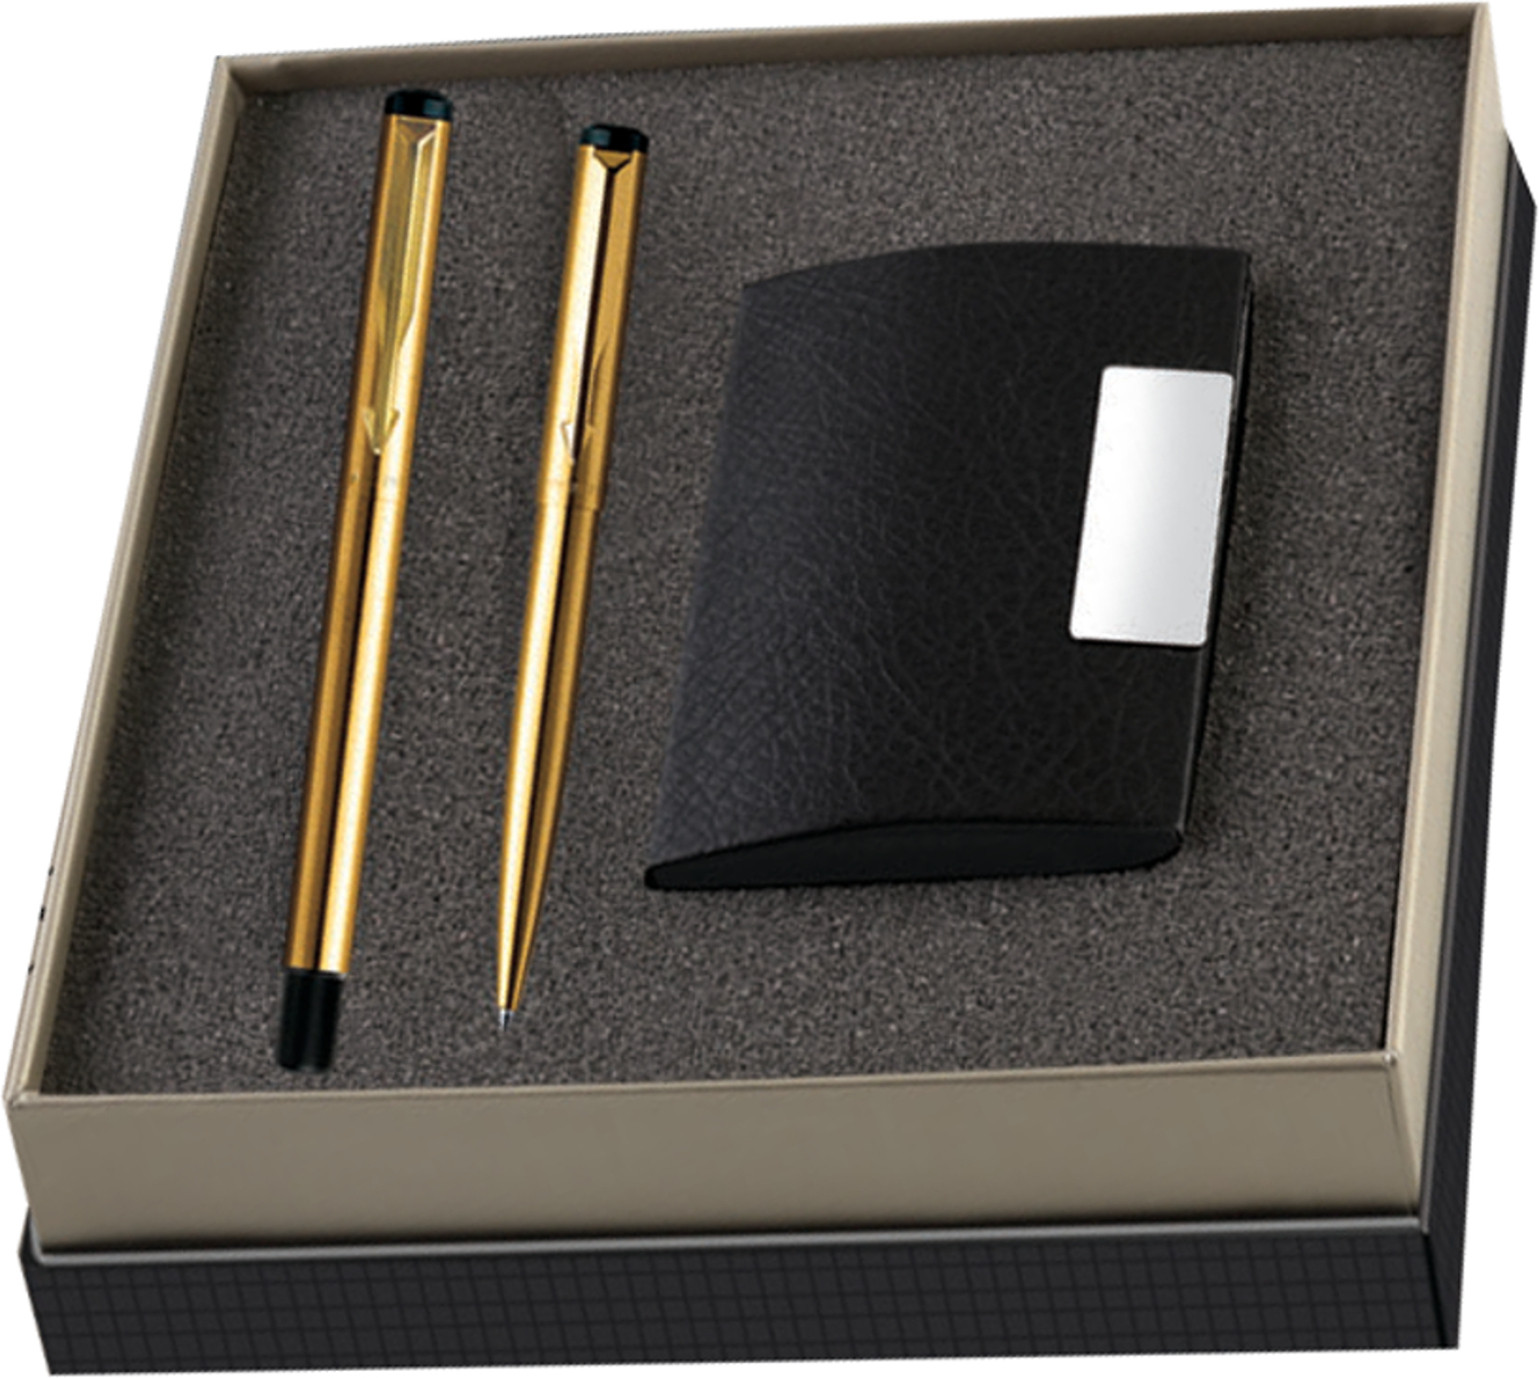 Parker pen online shopping india